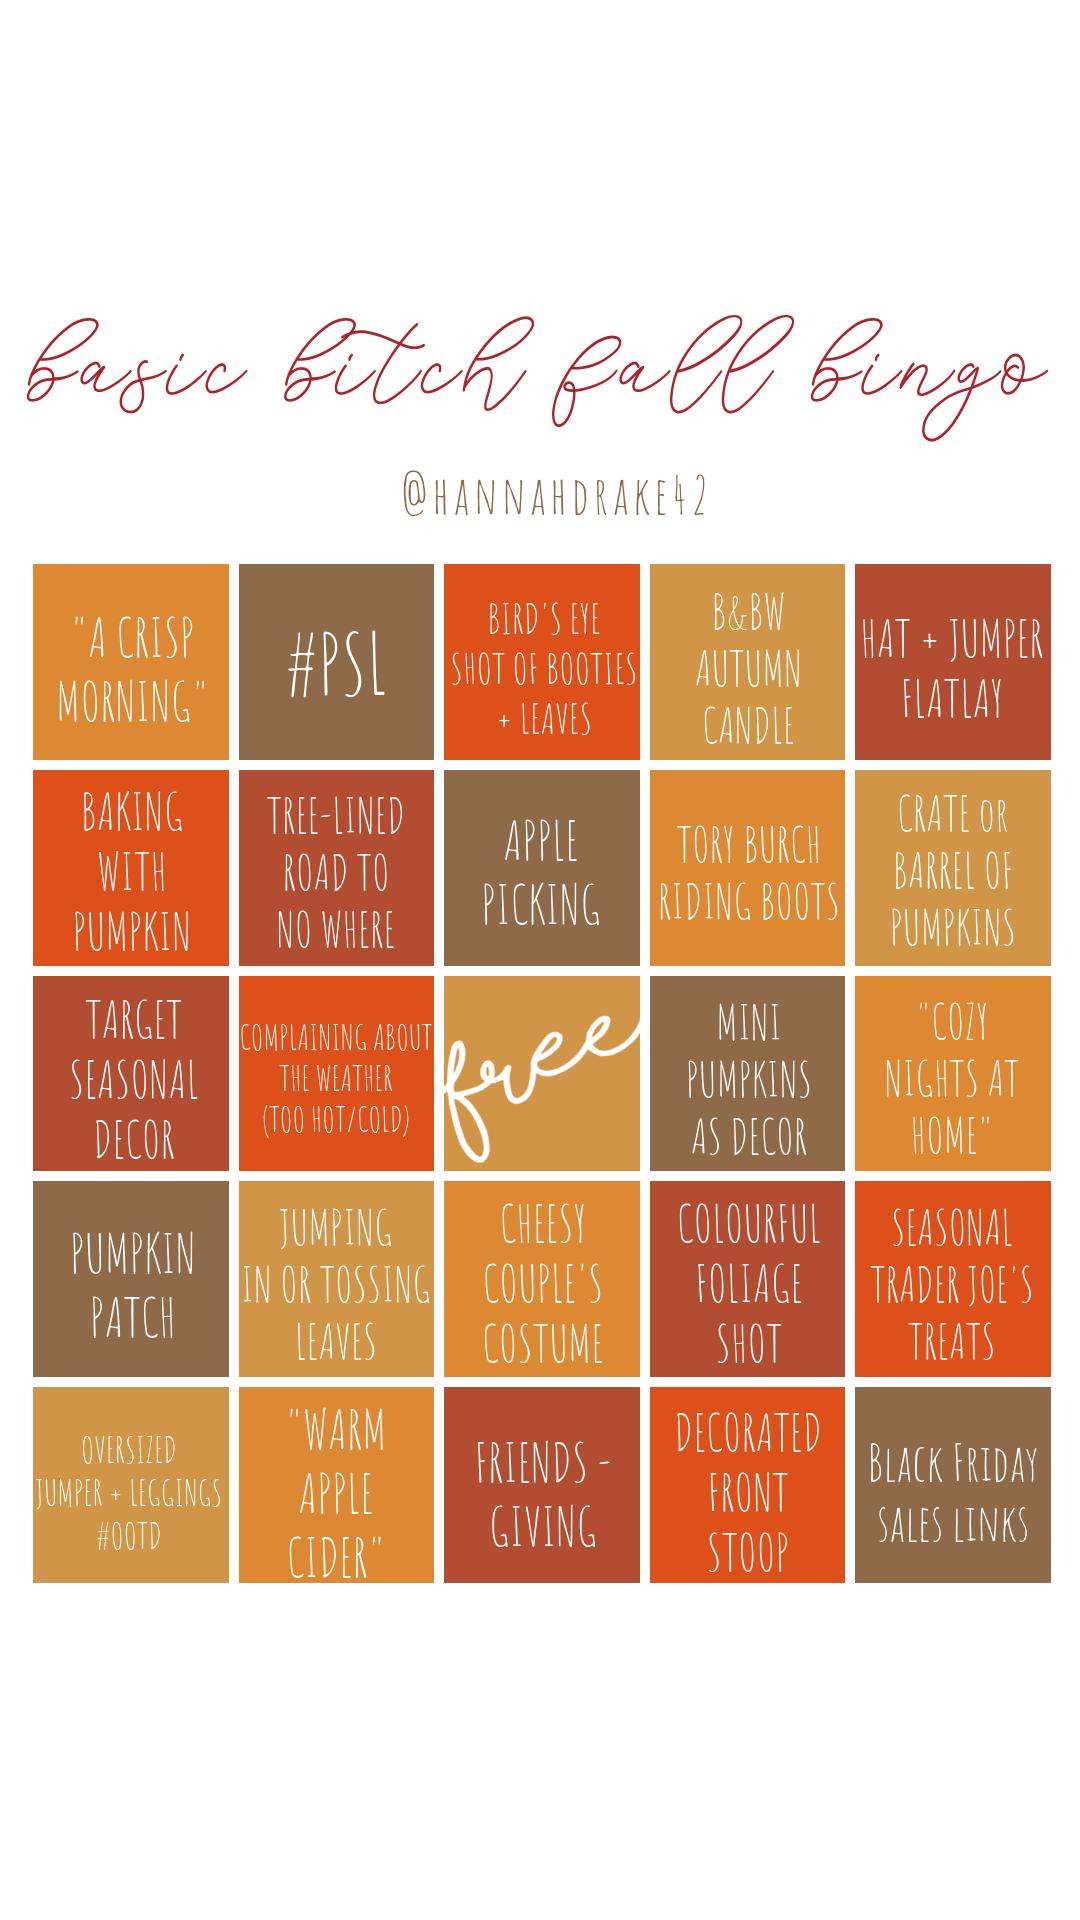 Basic Bitch Fall Bingo Instagram Stories @HannahDrake42